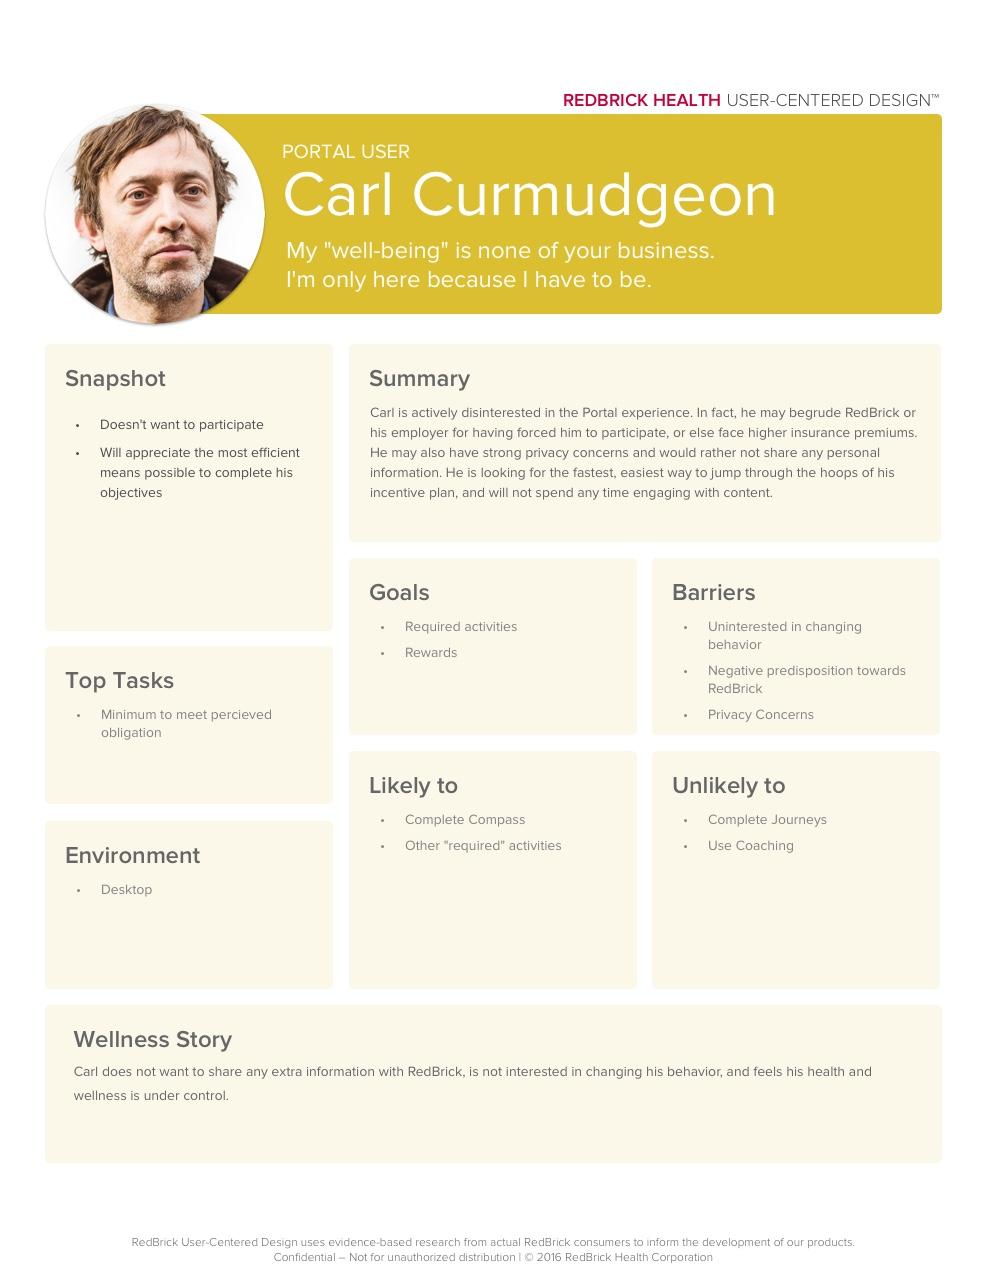 Portal User - Carl Curmudgeon.jpg